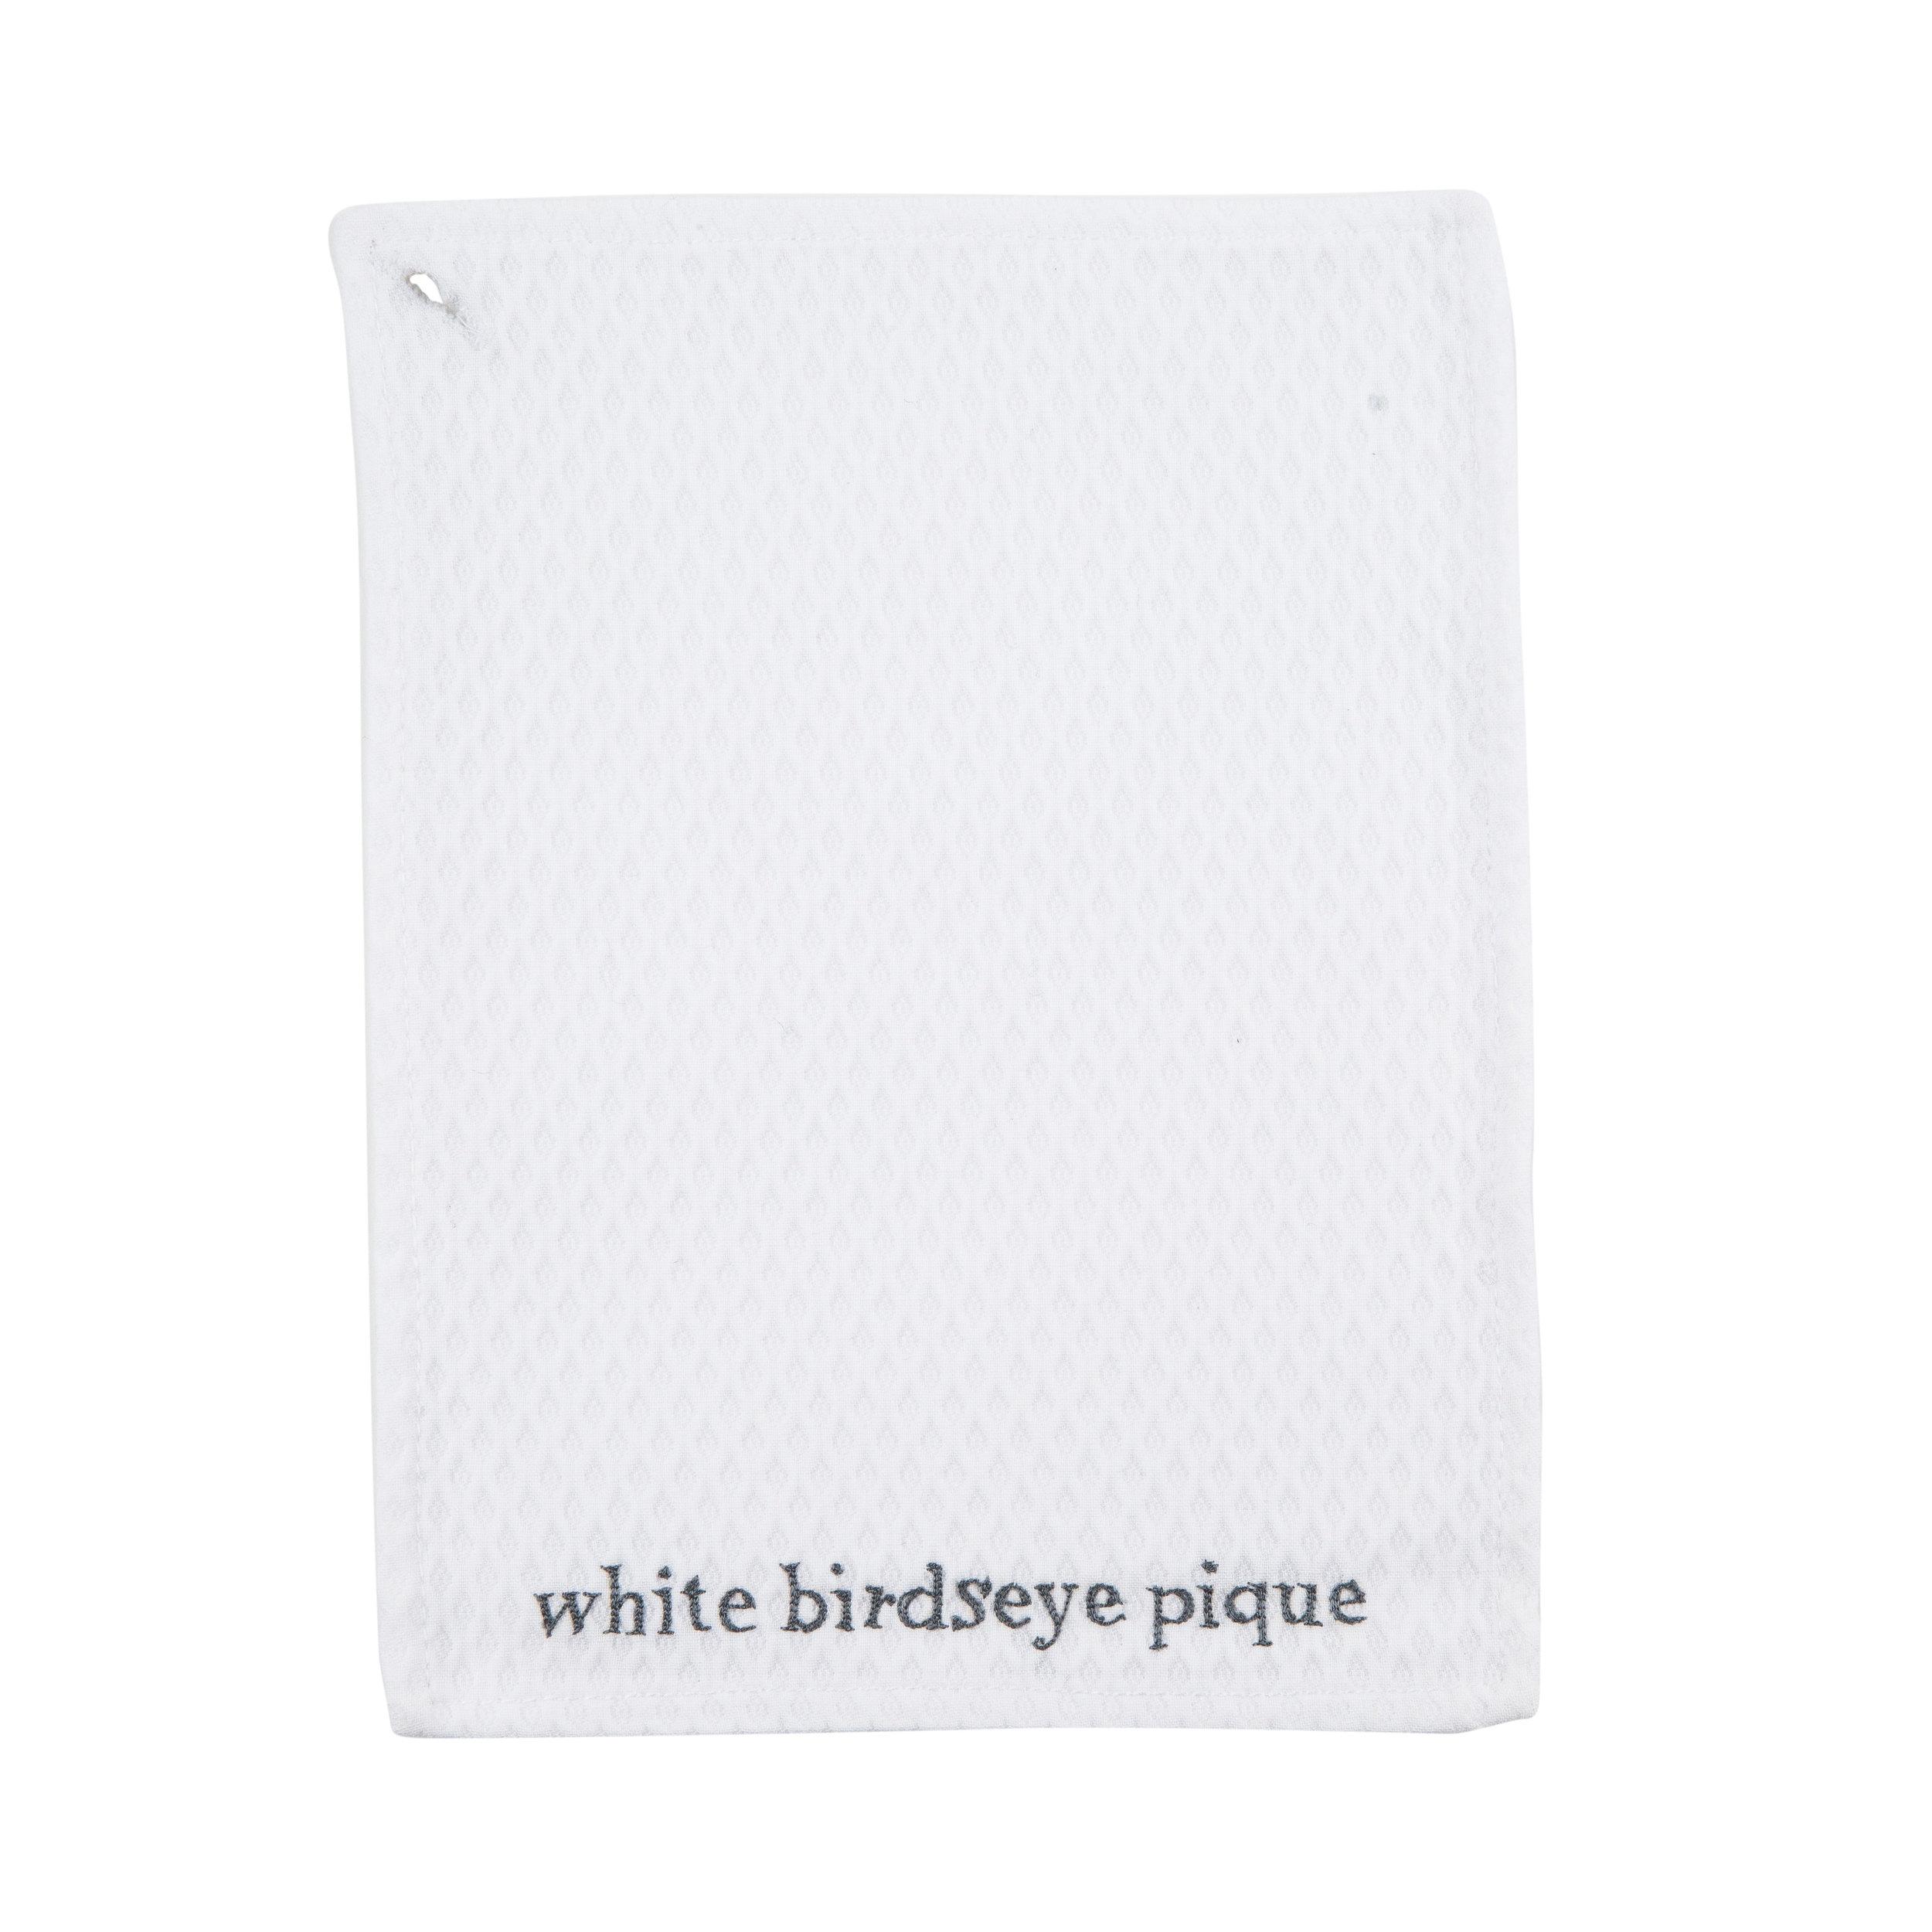 WHITE BIRDSEYE PIQUE